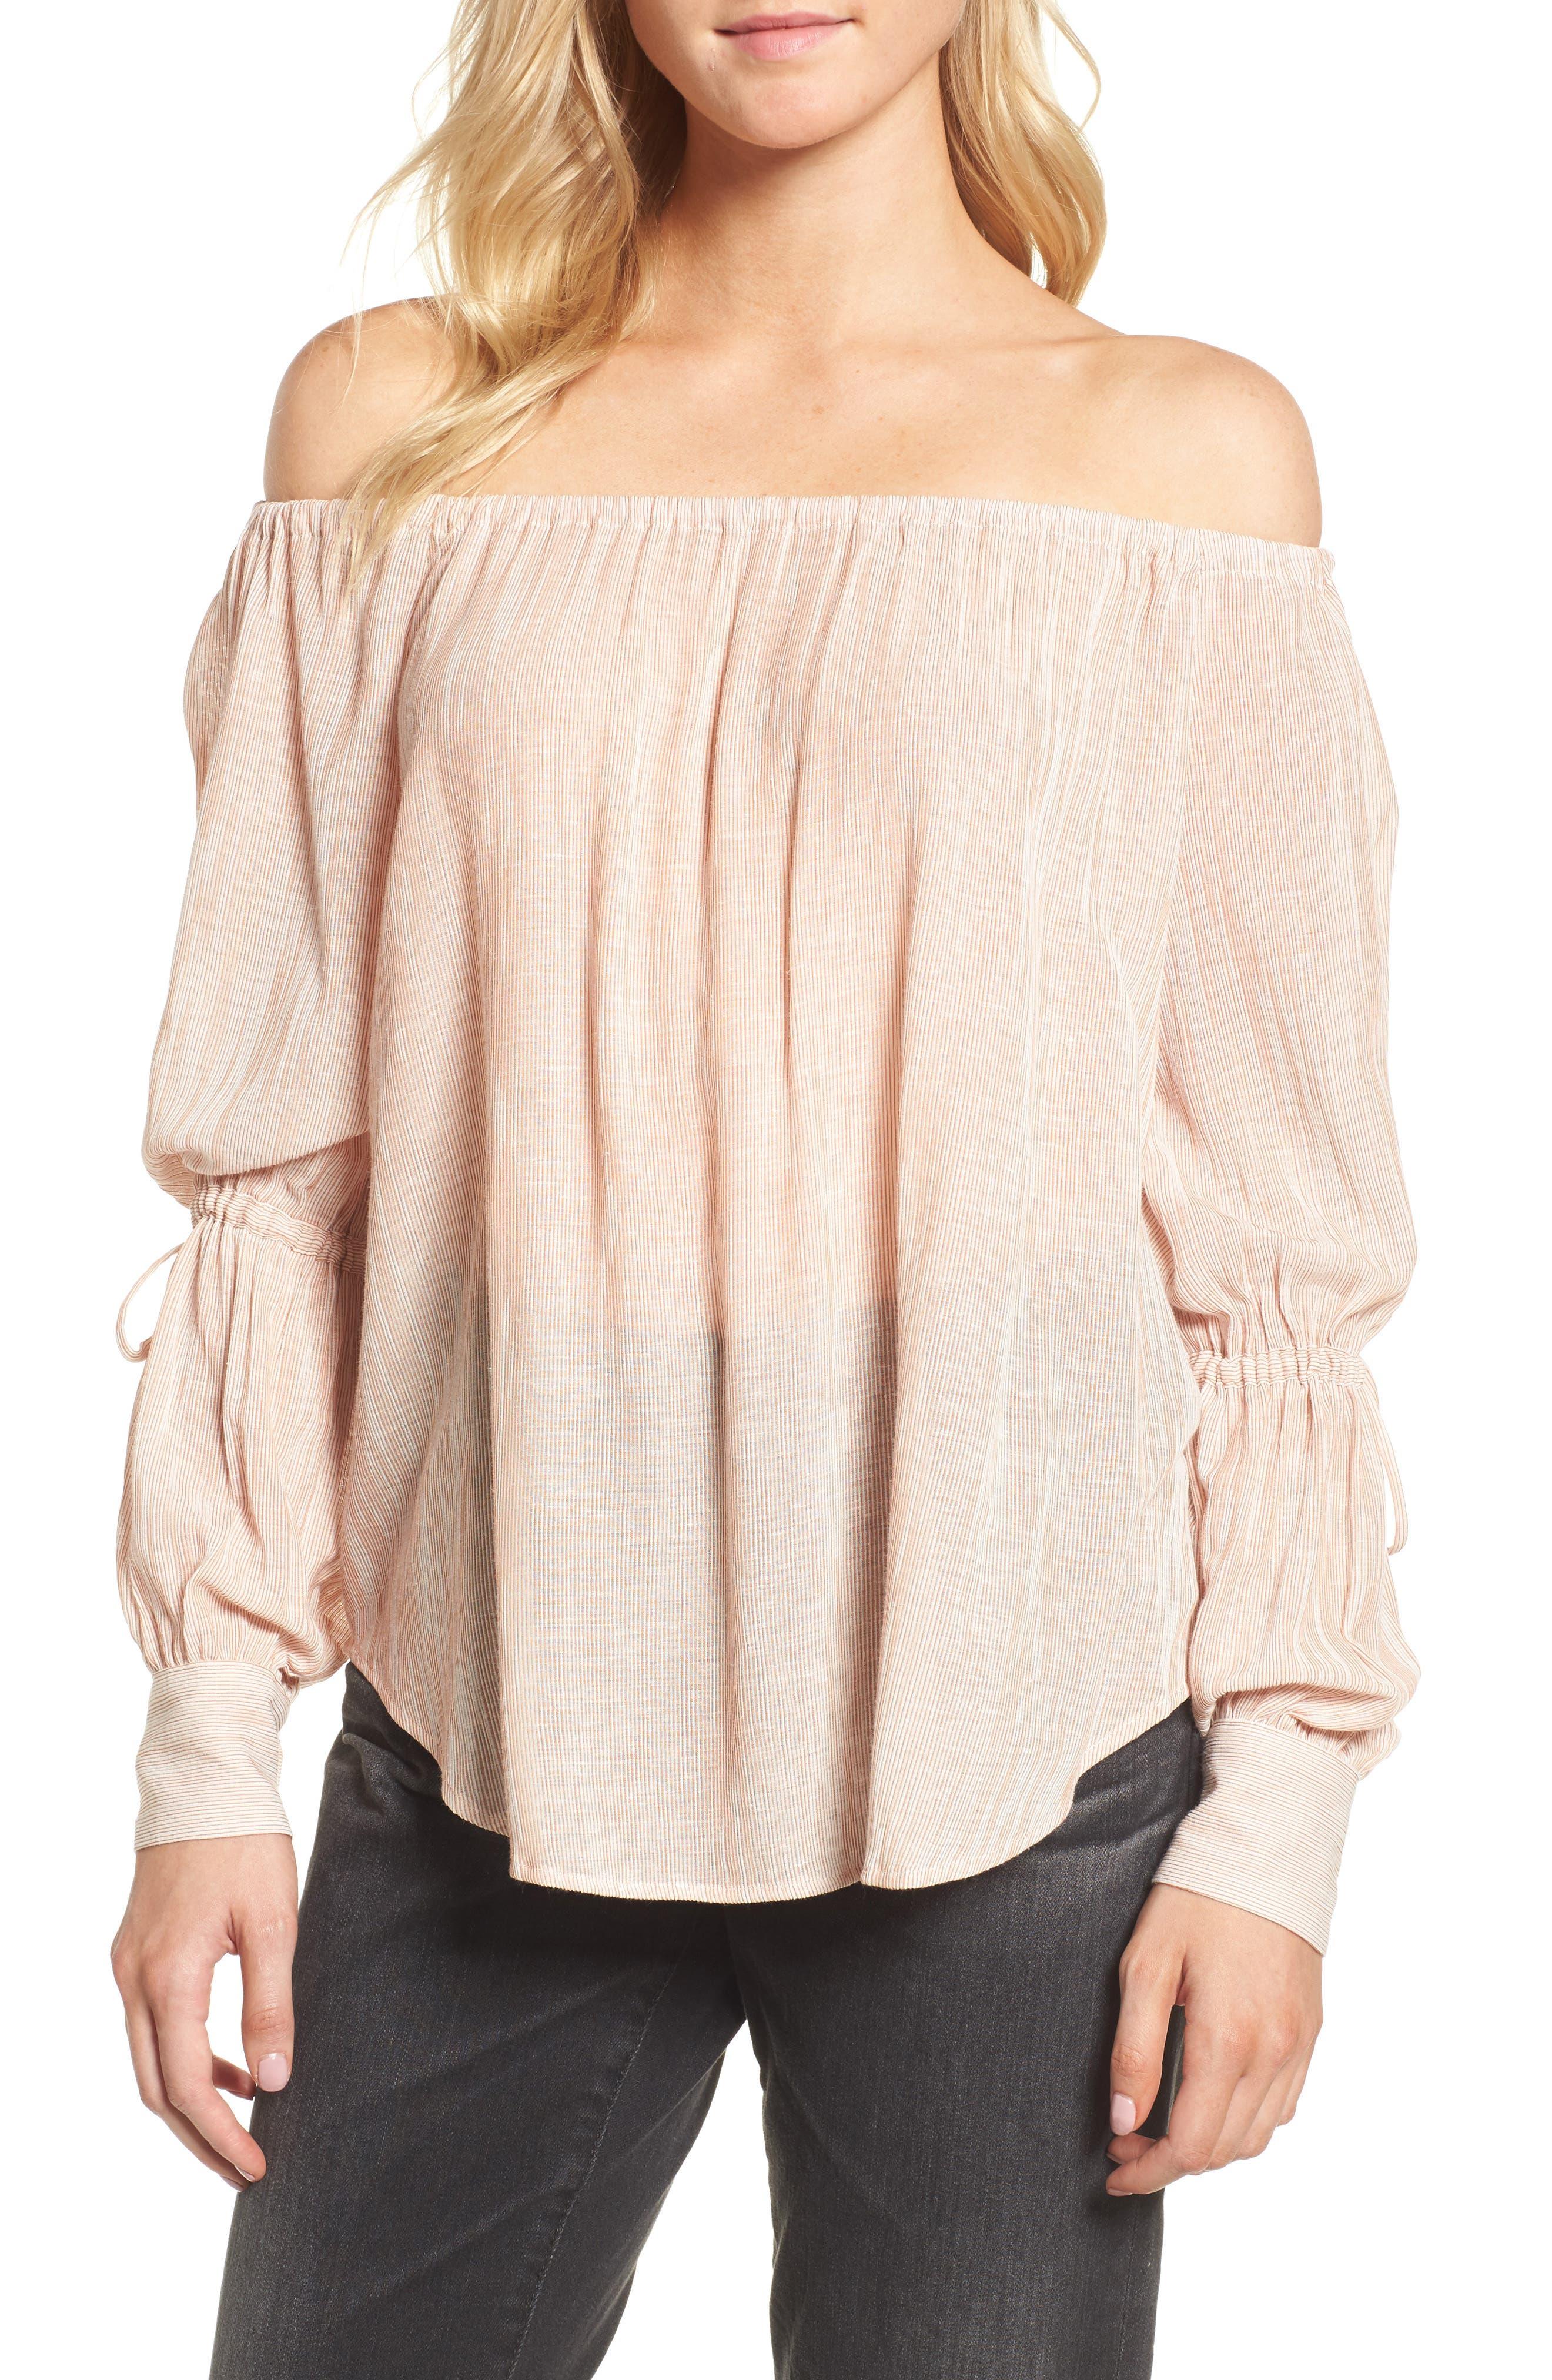 Tallulah Off the Shoulder Blouse,                         Main,                         color, Burnt Umber/ White